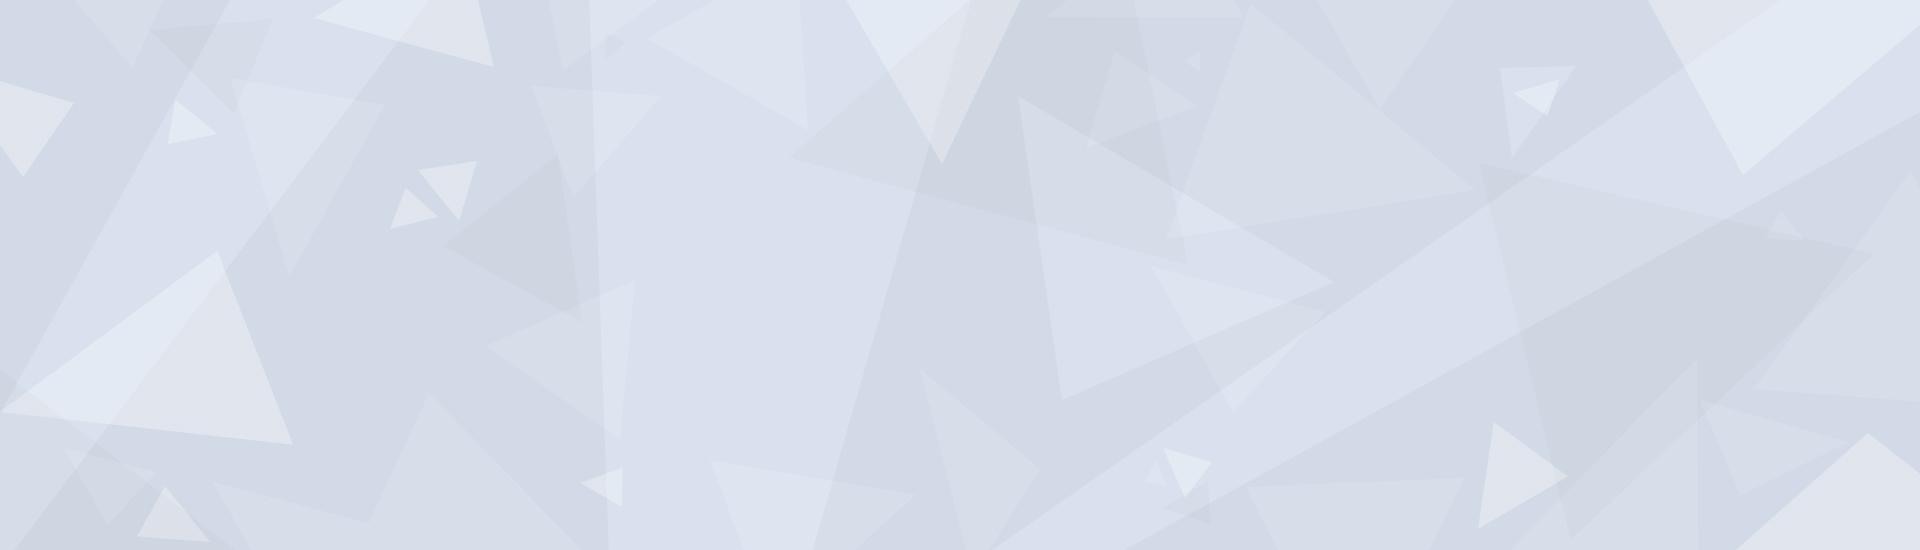 Mykeul974 - VSLeague Online eSport